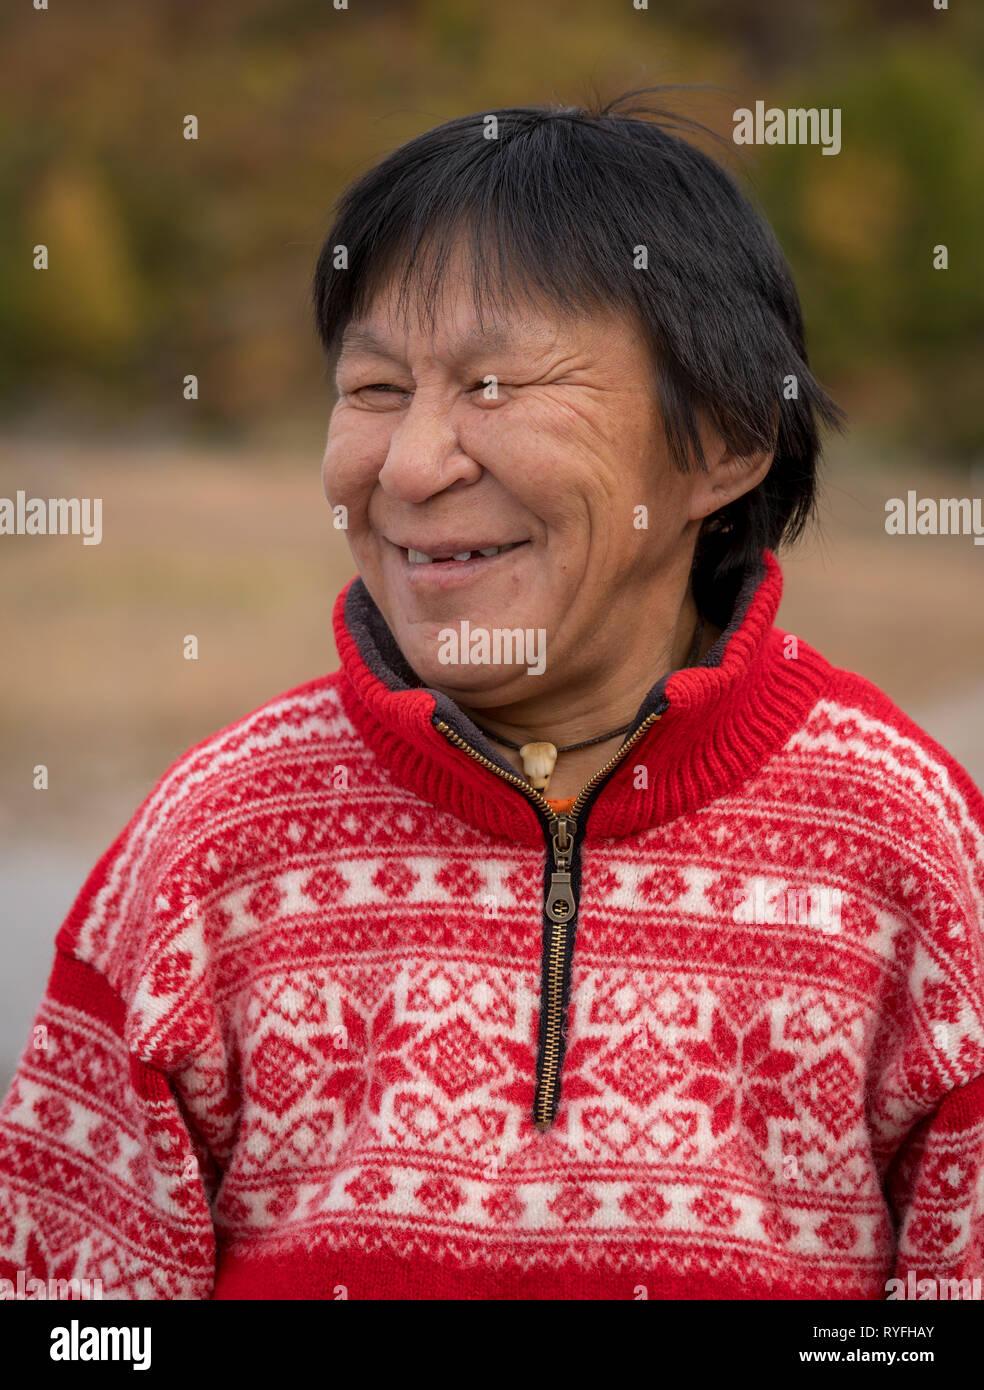 Female portrait, Narsasuaq, South Greenland - Stock Image